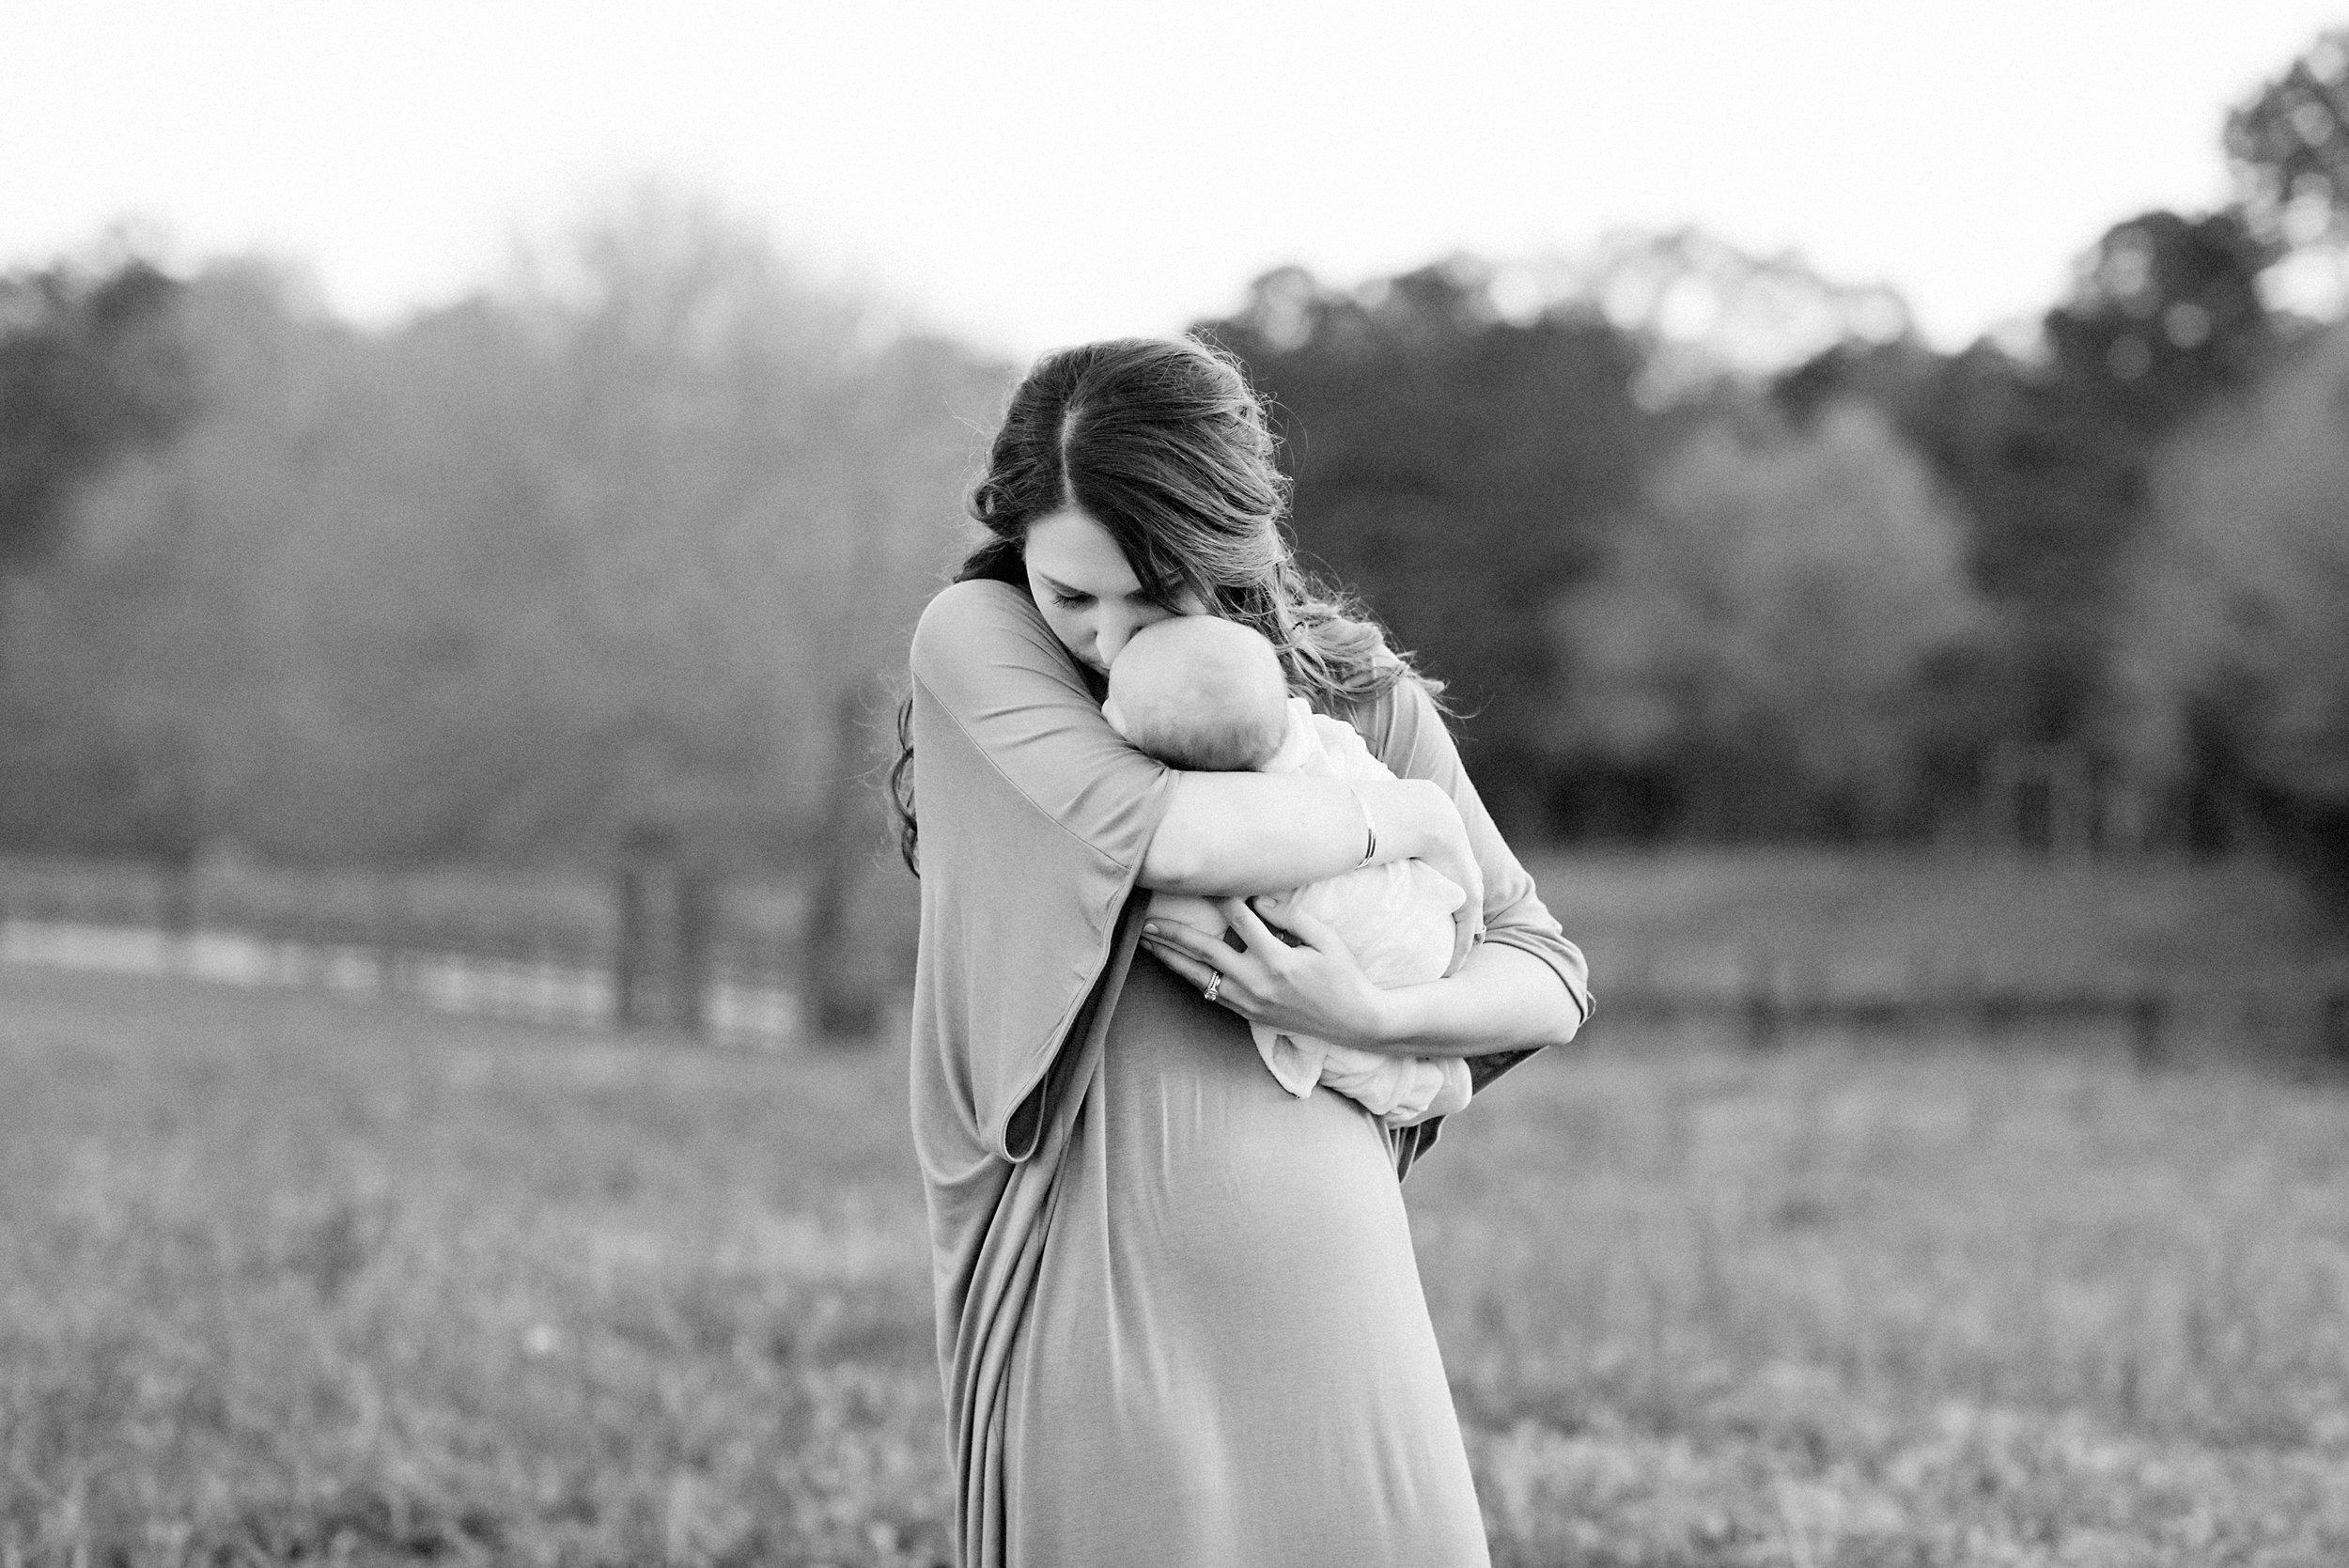 QuietSidePhotography-NorthernVA-Photographer-LoudounCountyVA-newborn-maternity-family-motherhood.jpg